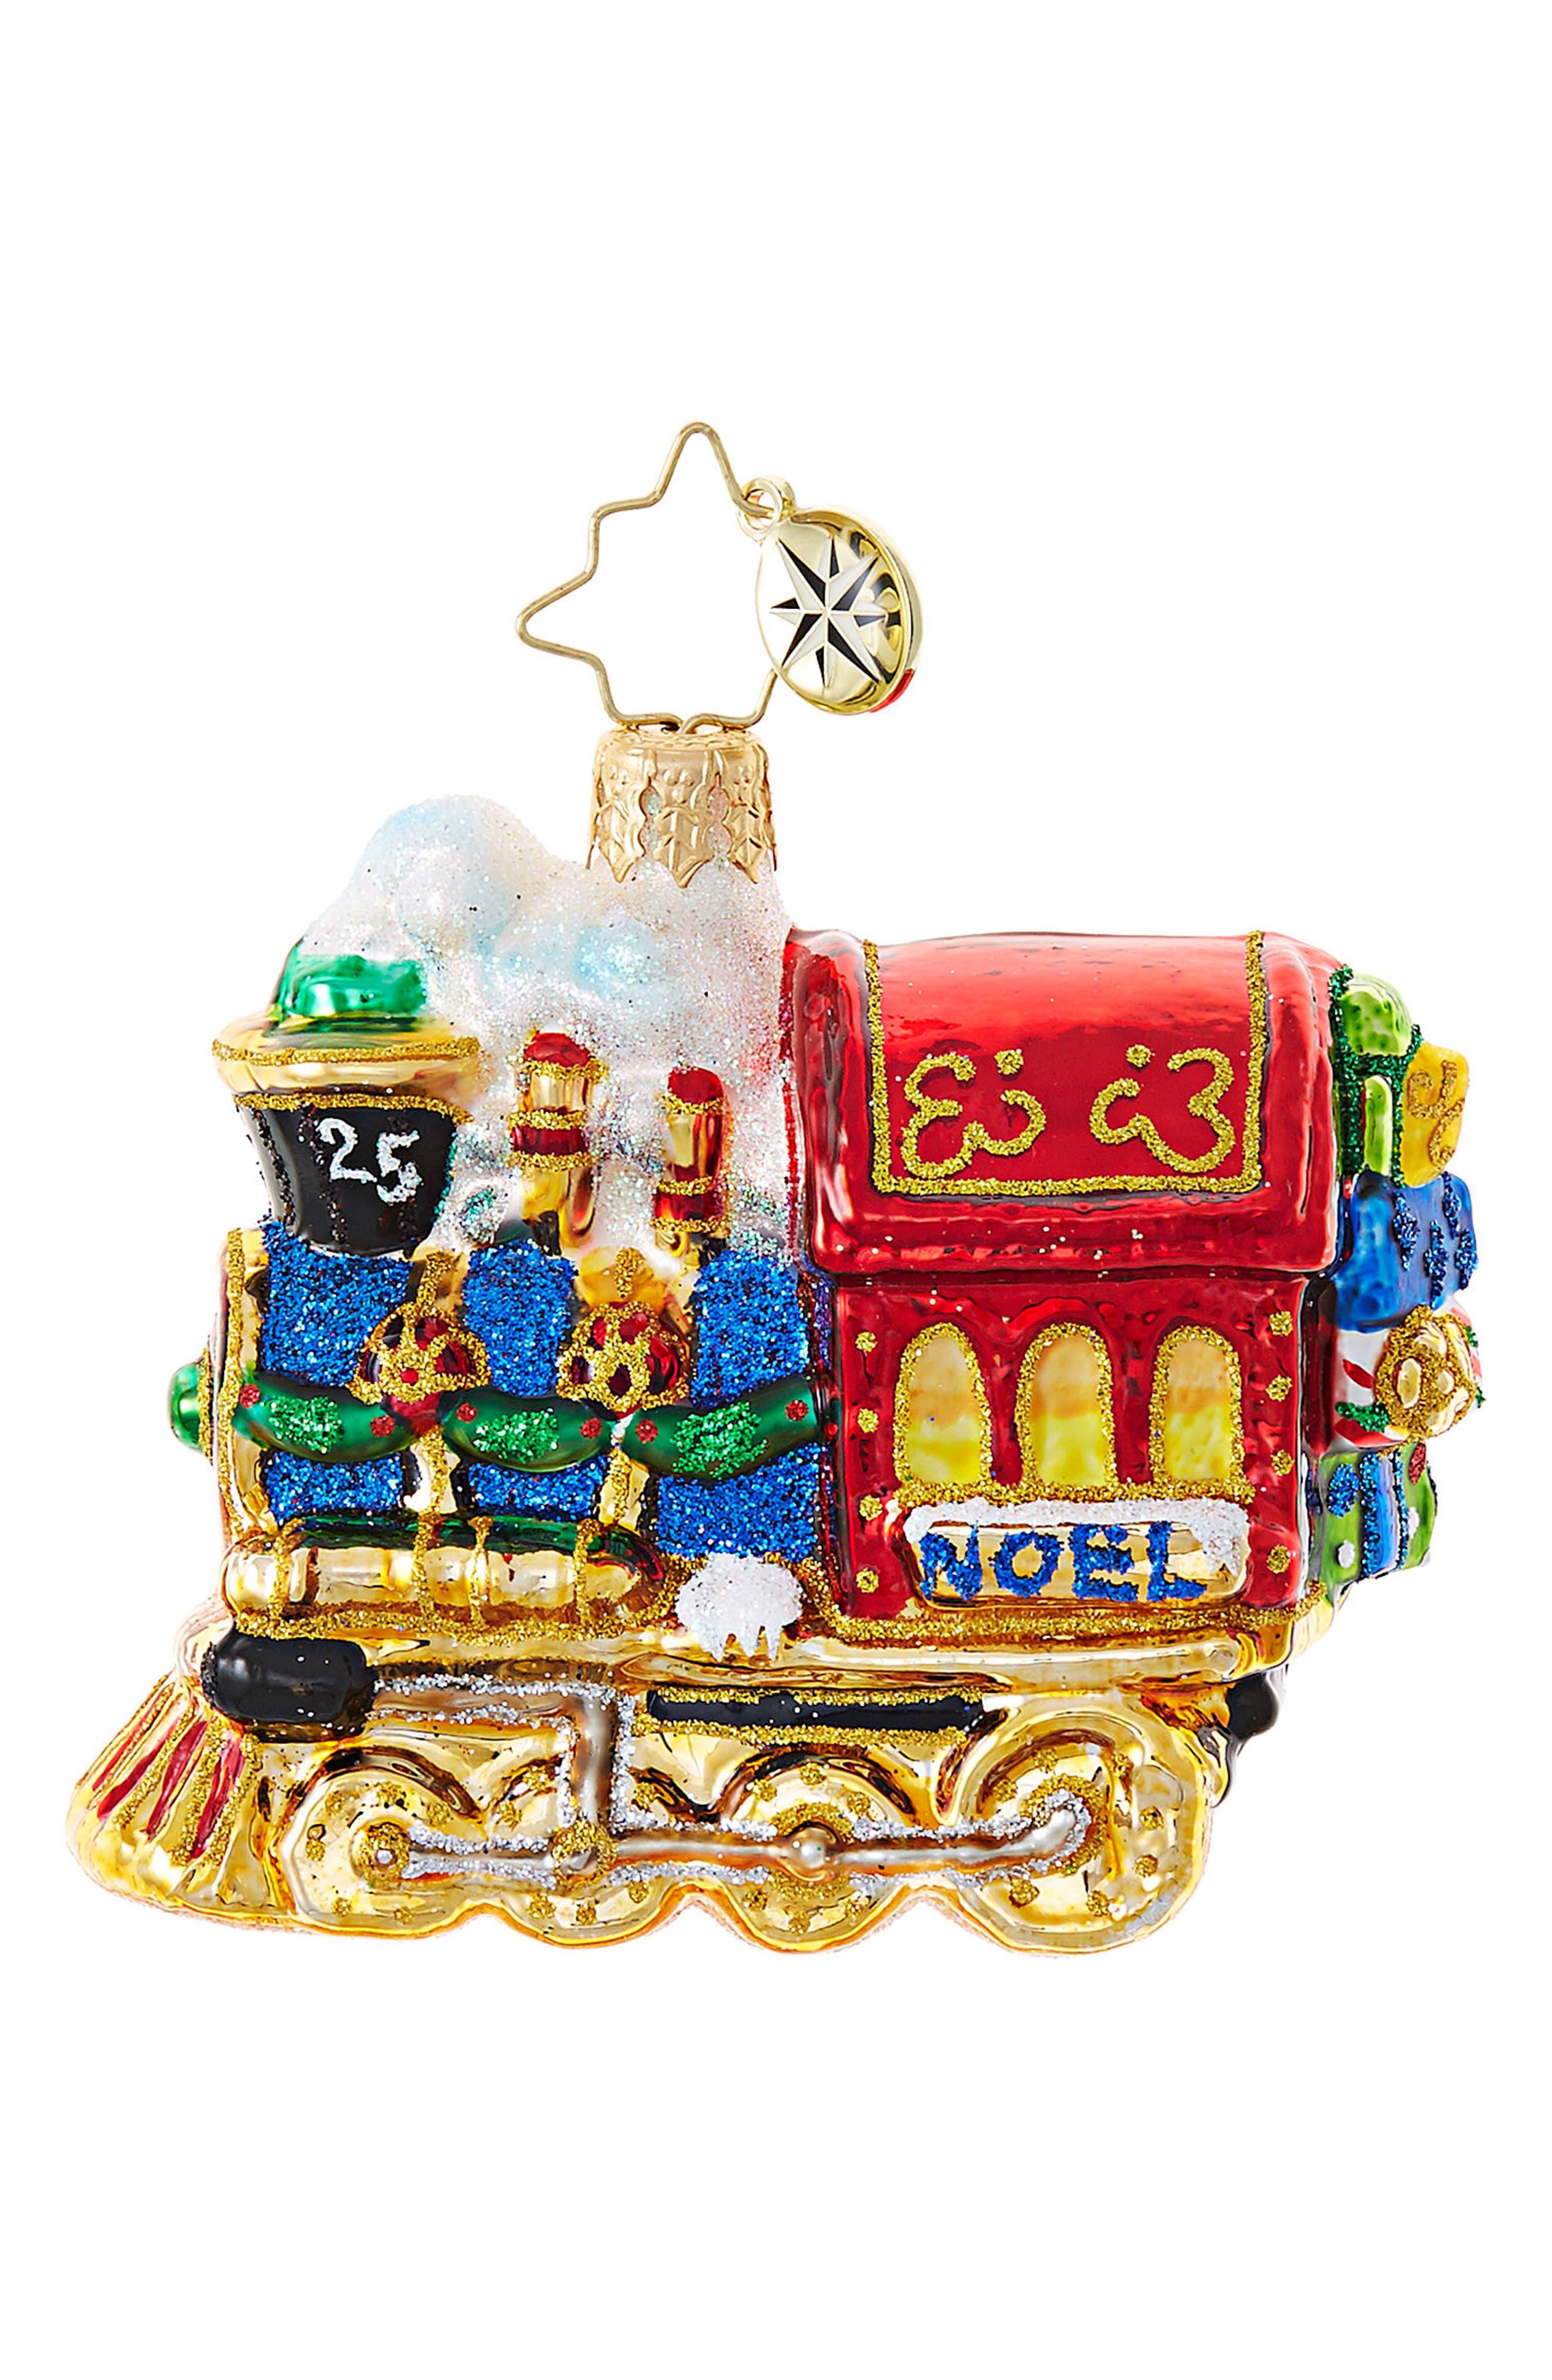 All Aboard Train Ornament,                             Main thumbnail 1, color,                             600